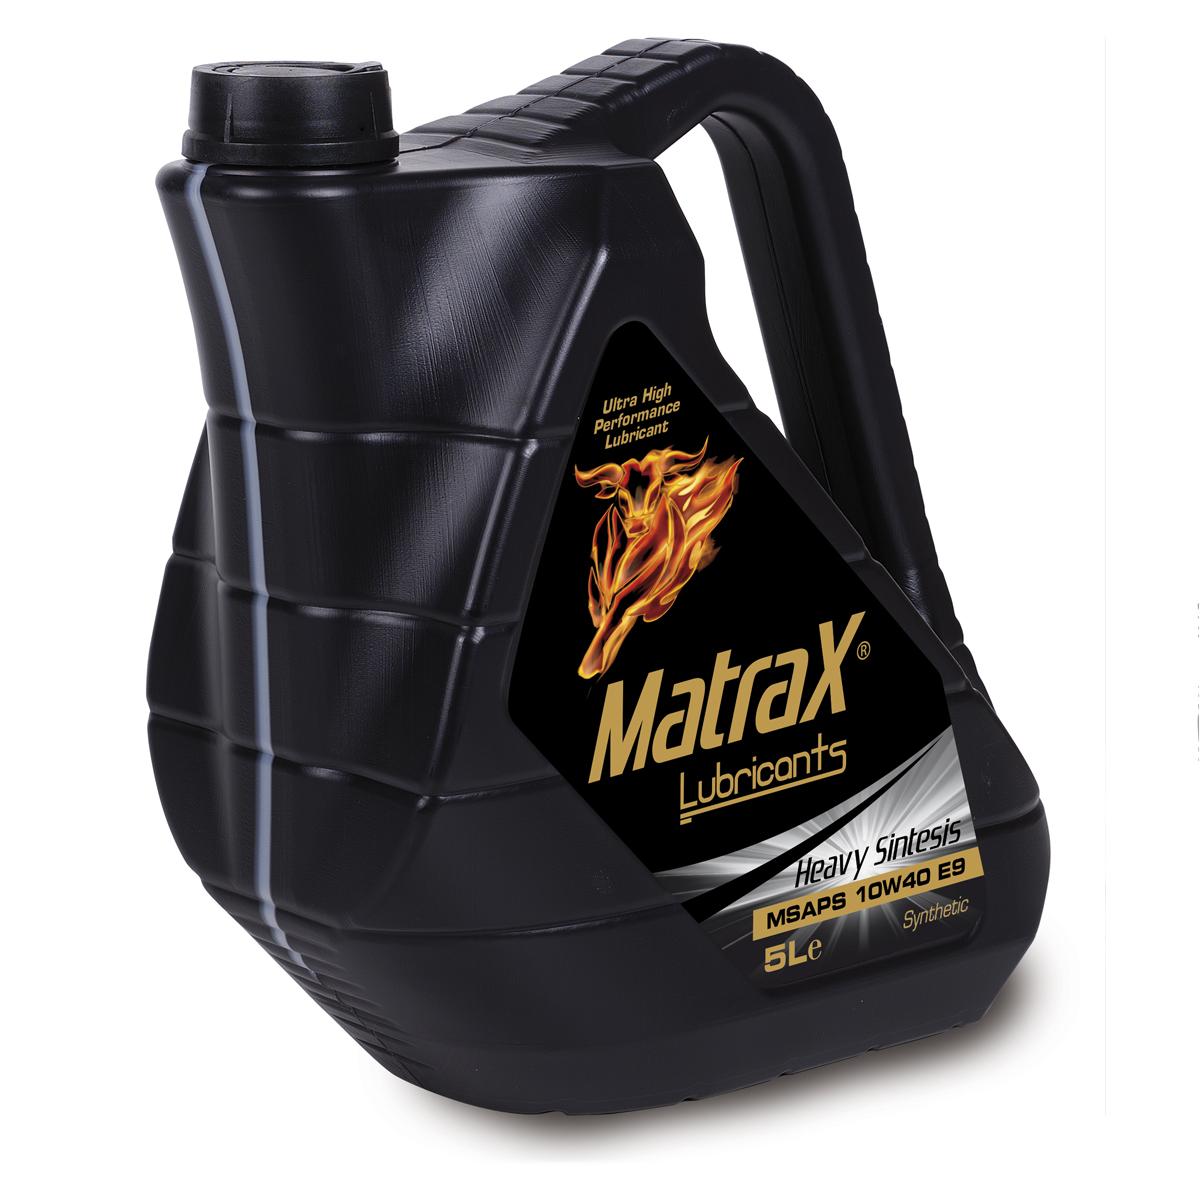 MatraX Heavy Sintesis MSAPS 10W40 E9